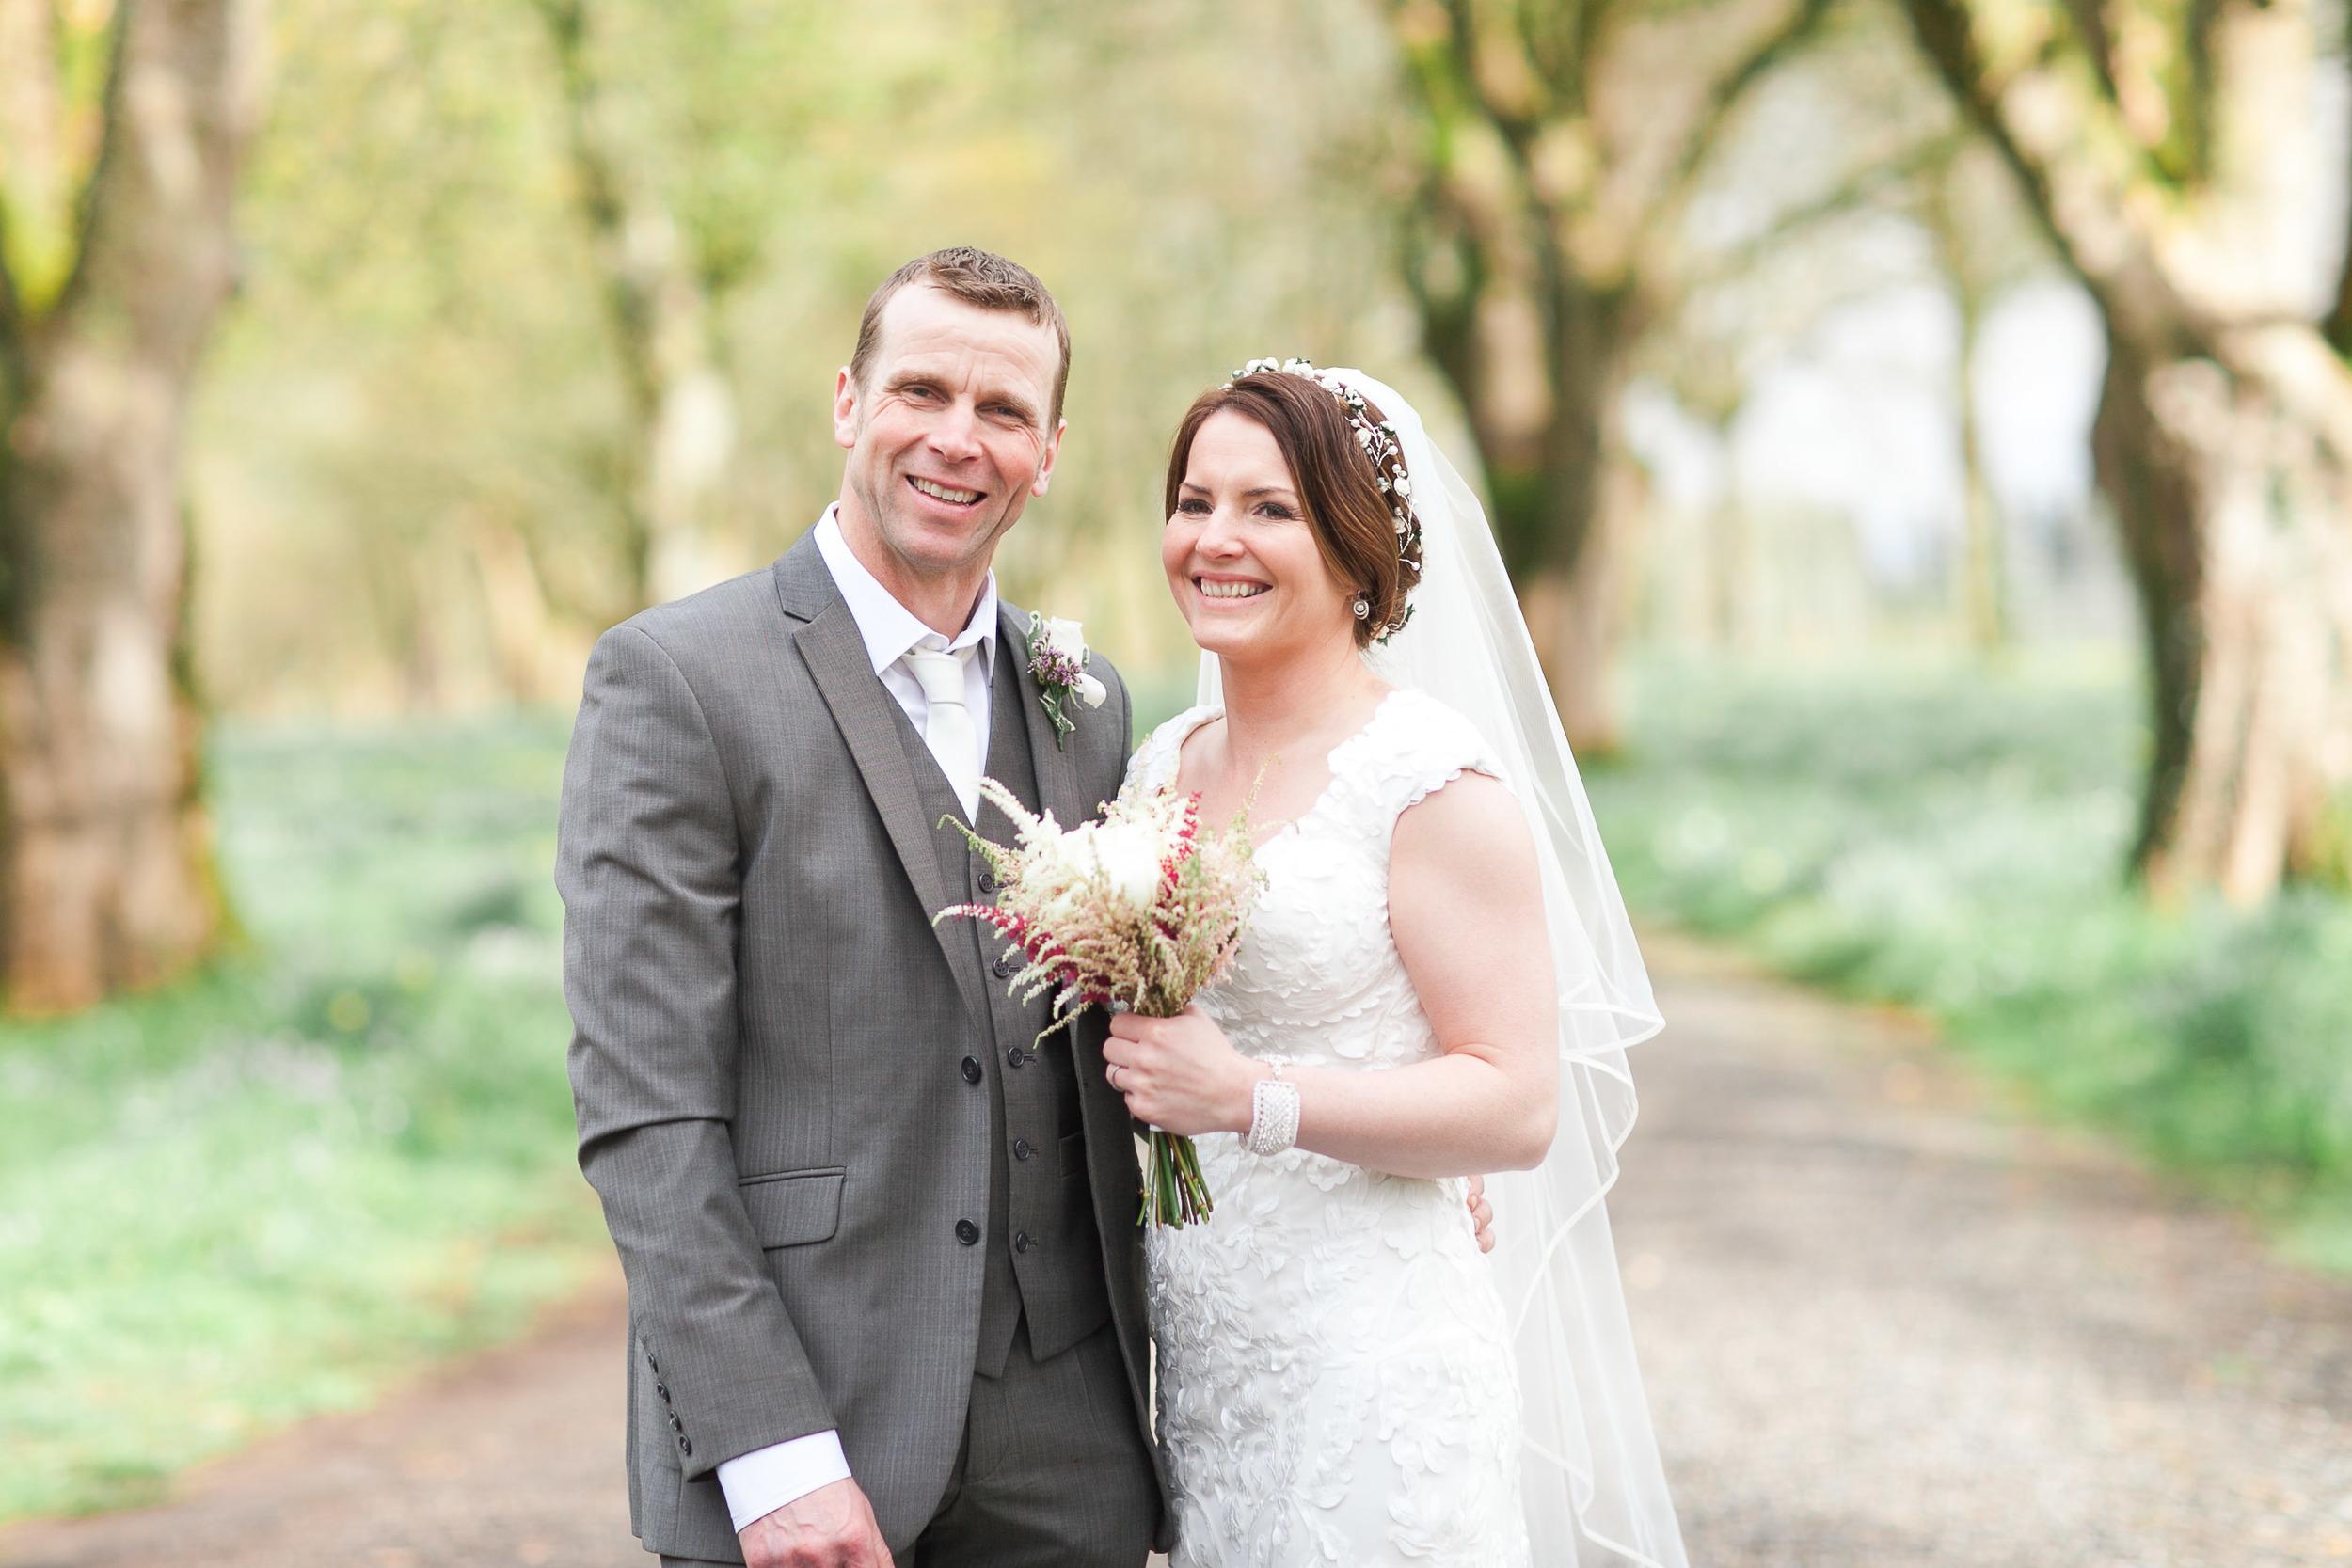 Ireland-Kildare-Wedding-Photographer-0016.jpg